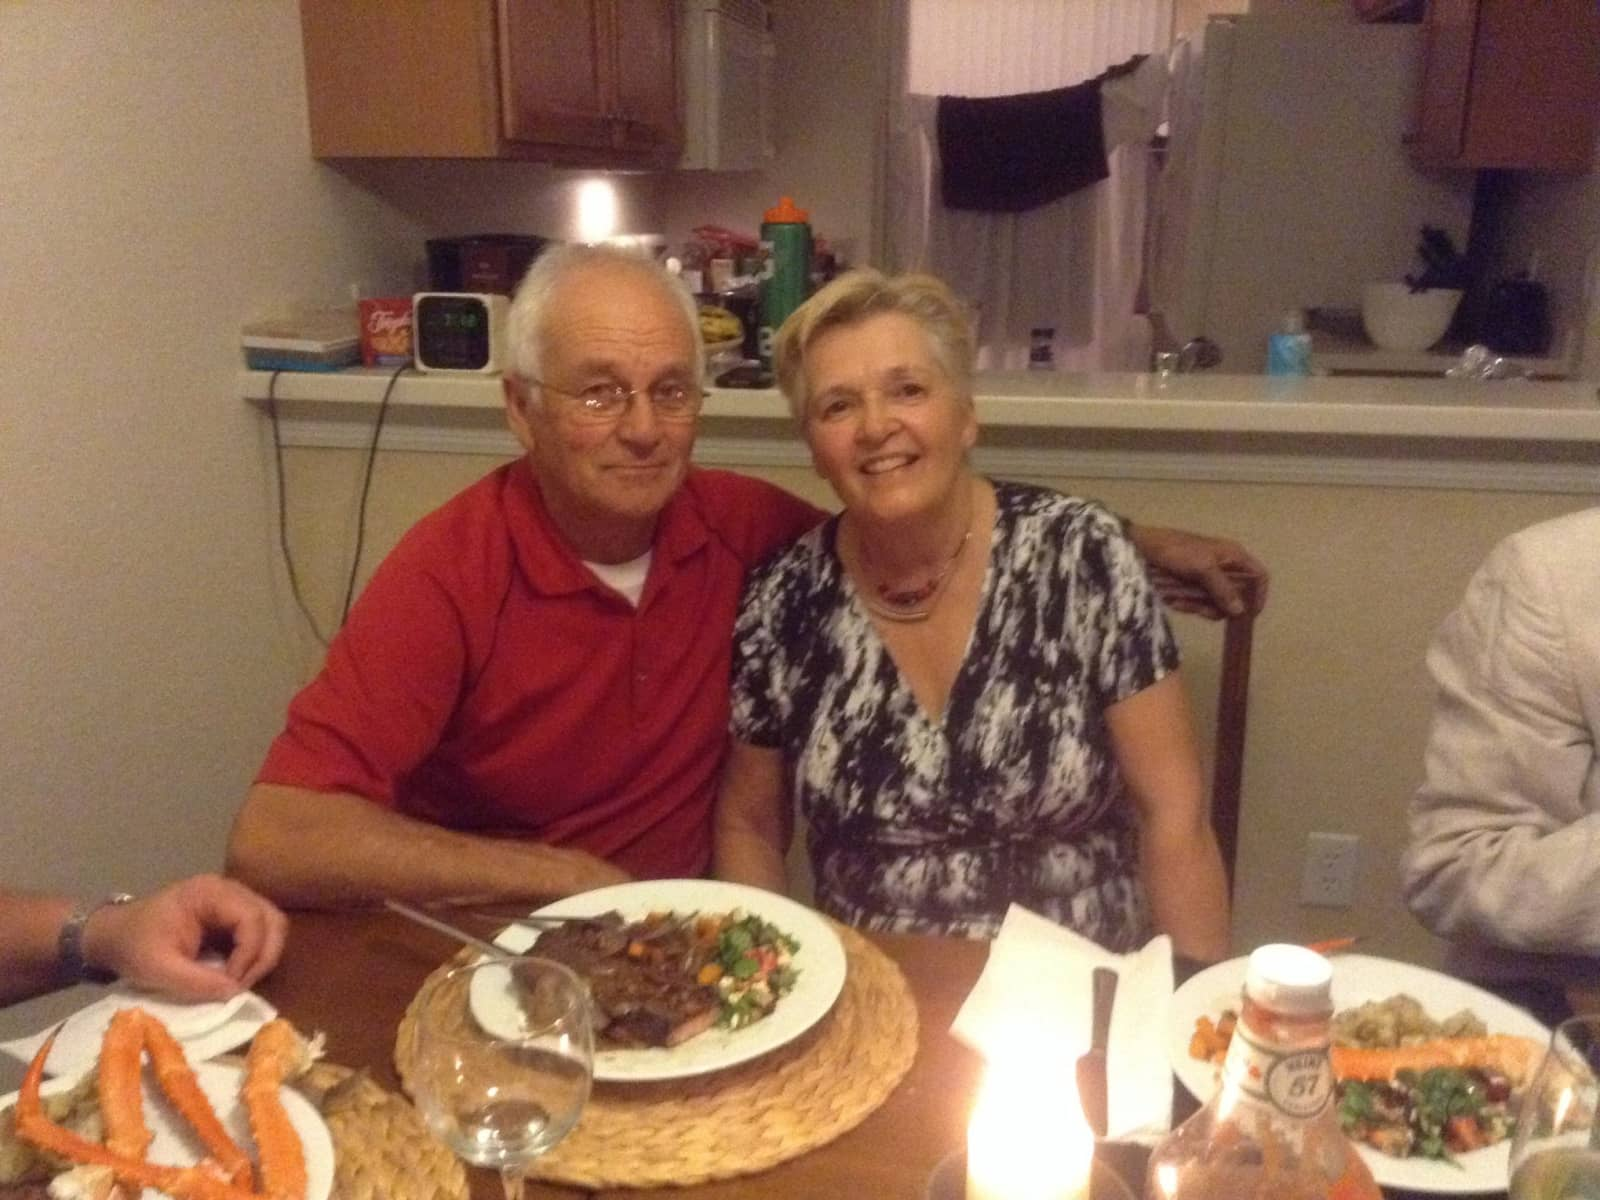 Marjan & Harm from St. Catharines, Ontario, Canada